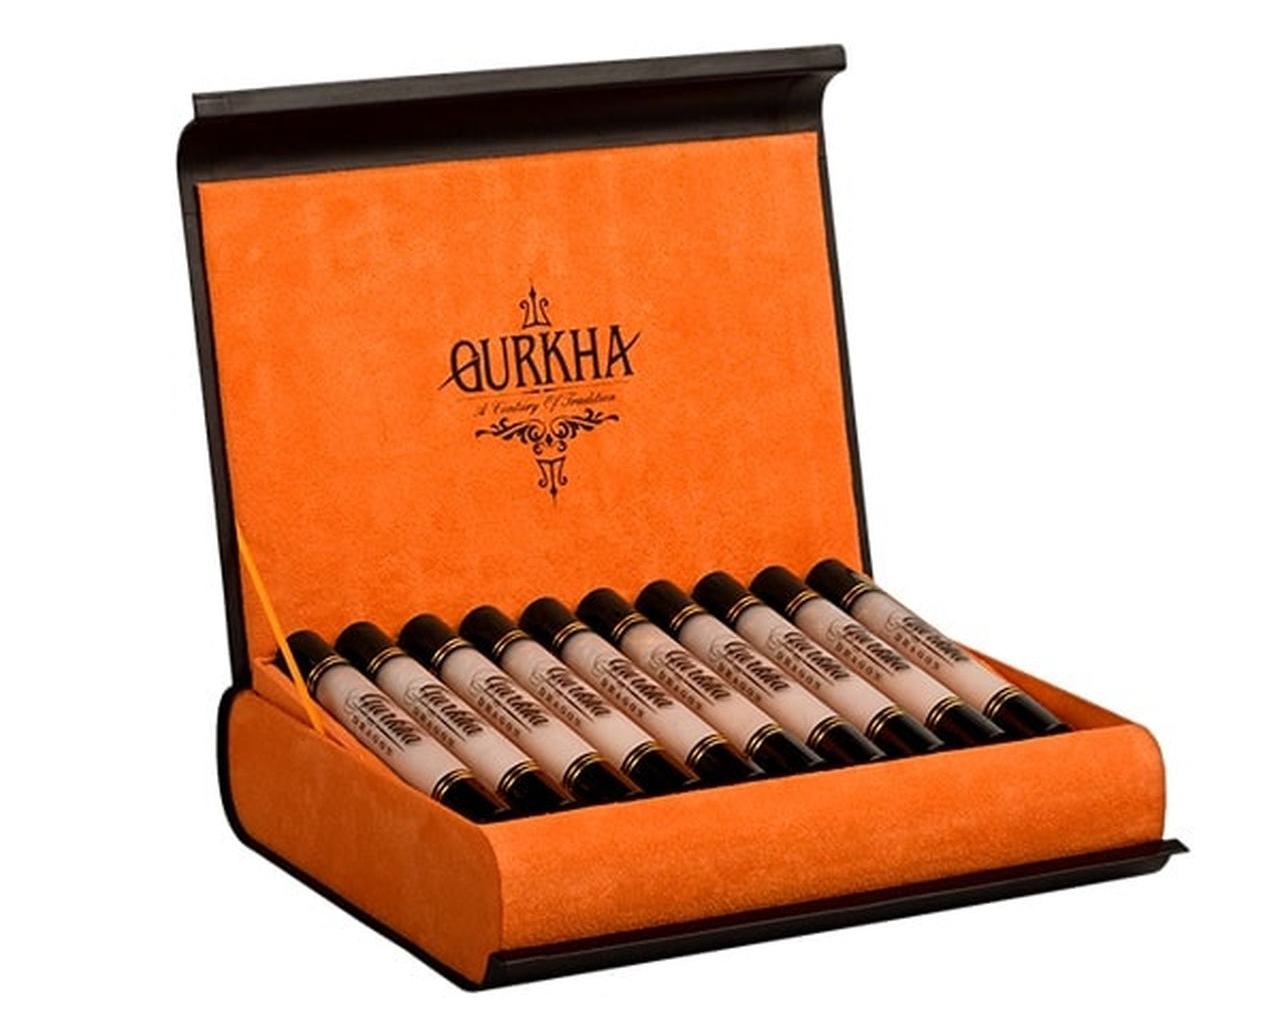 Gurkha Black Dragon Cigars box price, expensive cigars